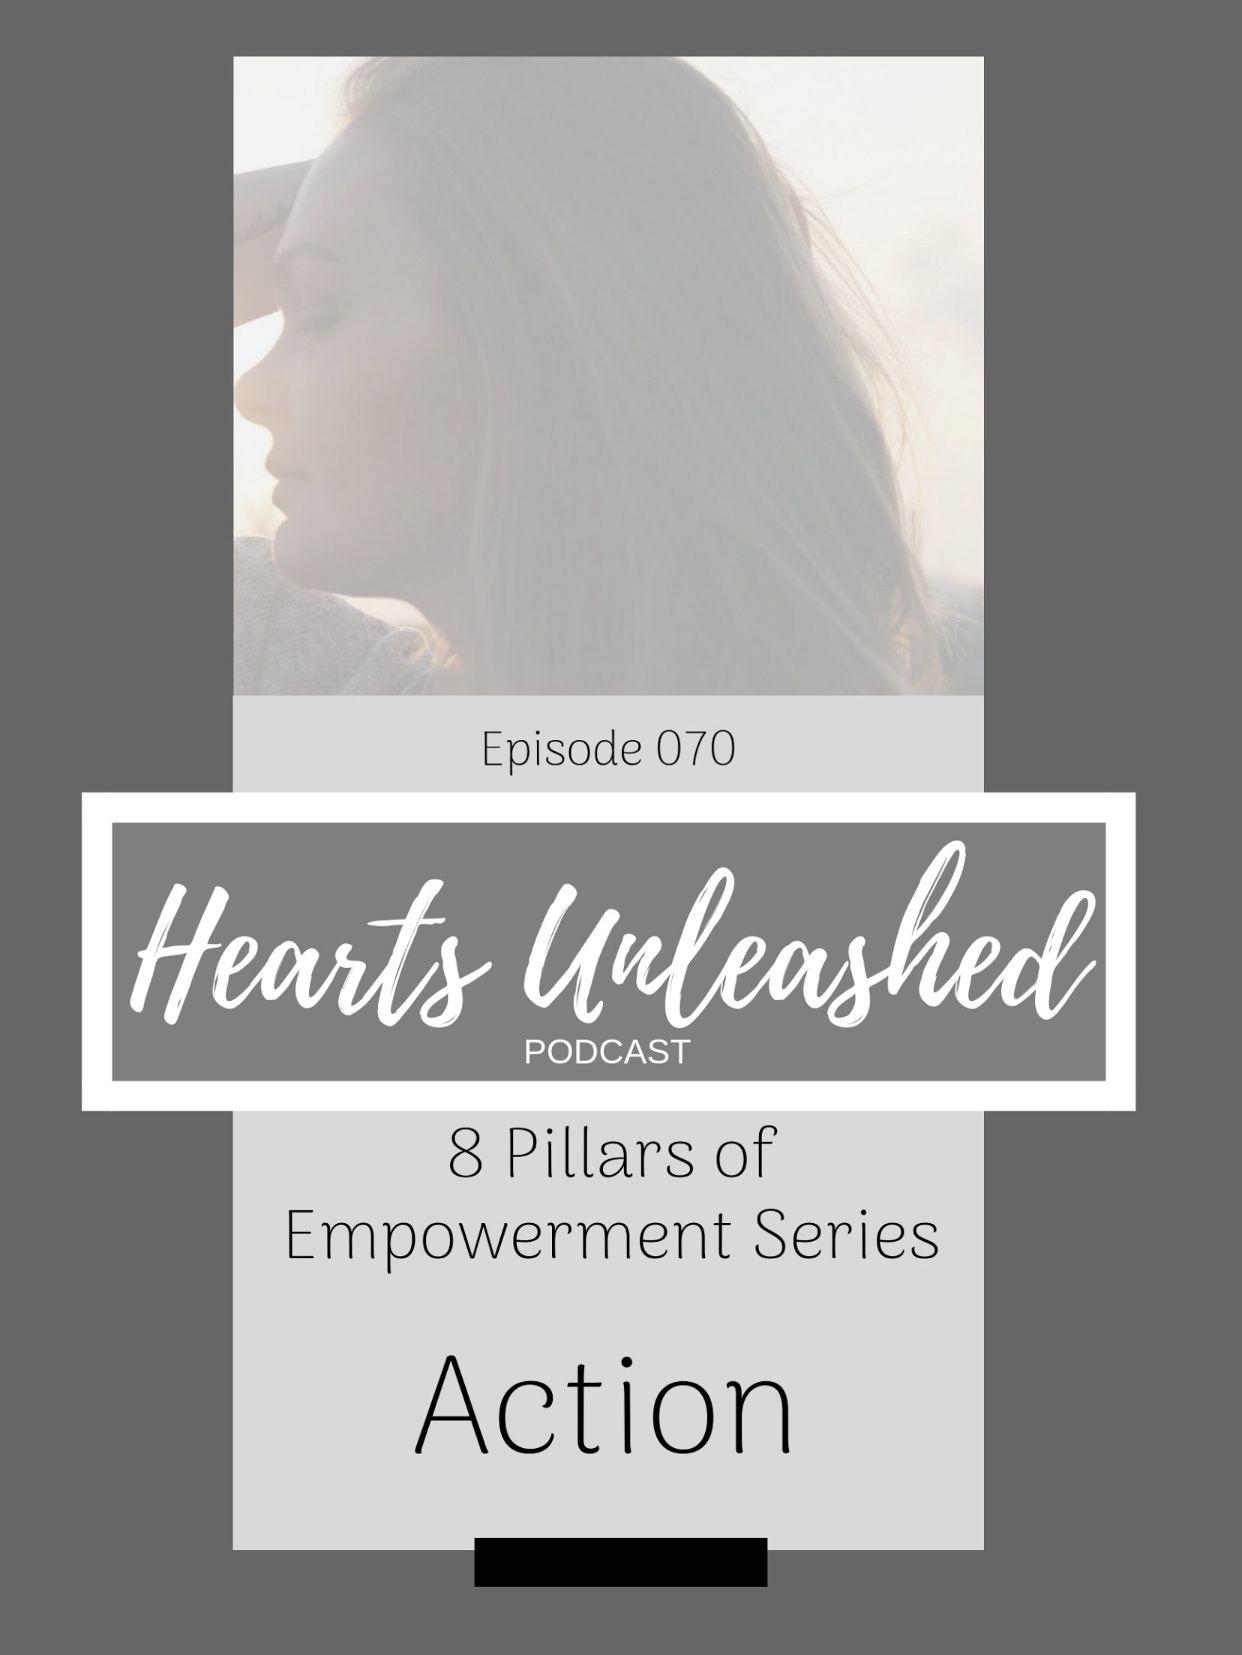 070 8 Pillars Of Empowerment Series Day 8 Action